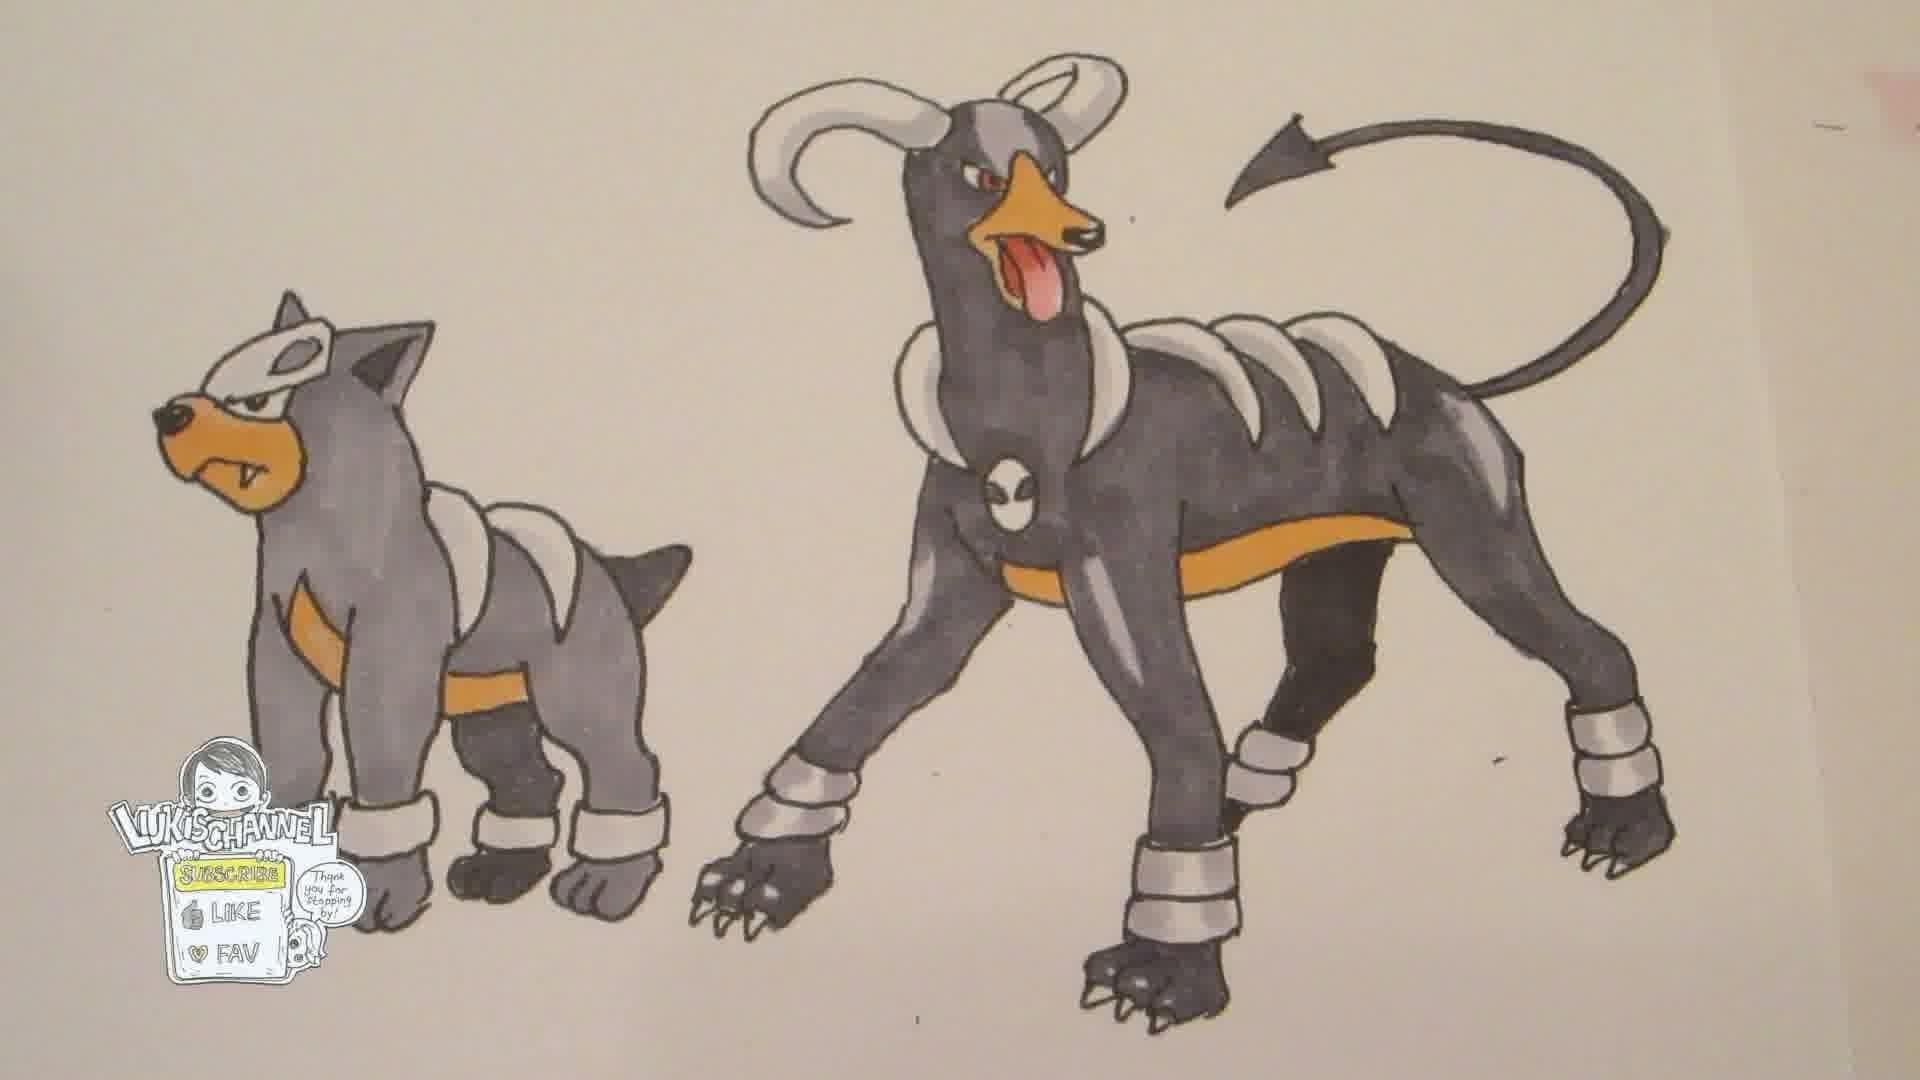 How to draw Pokemon: No.228 Houndour, No.229 Houndoom